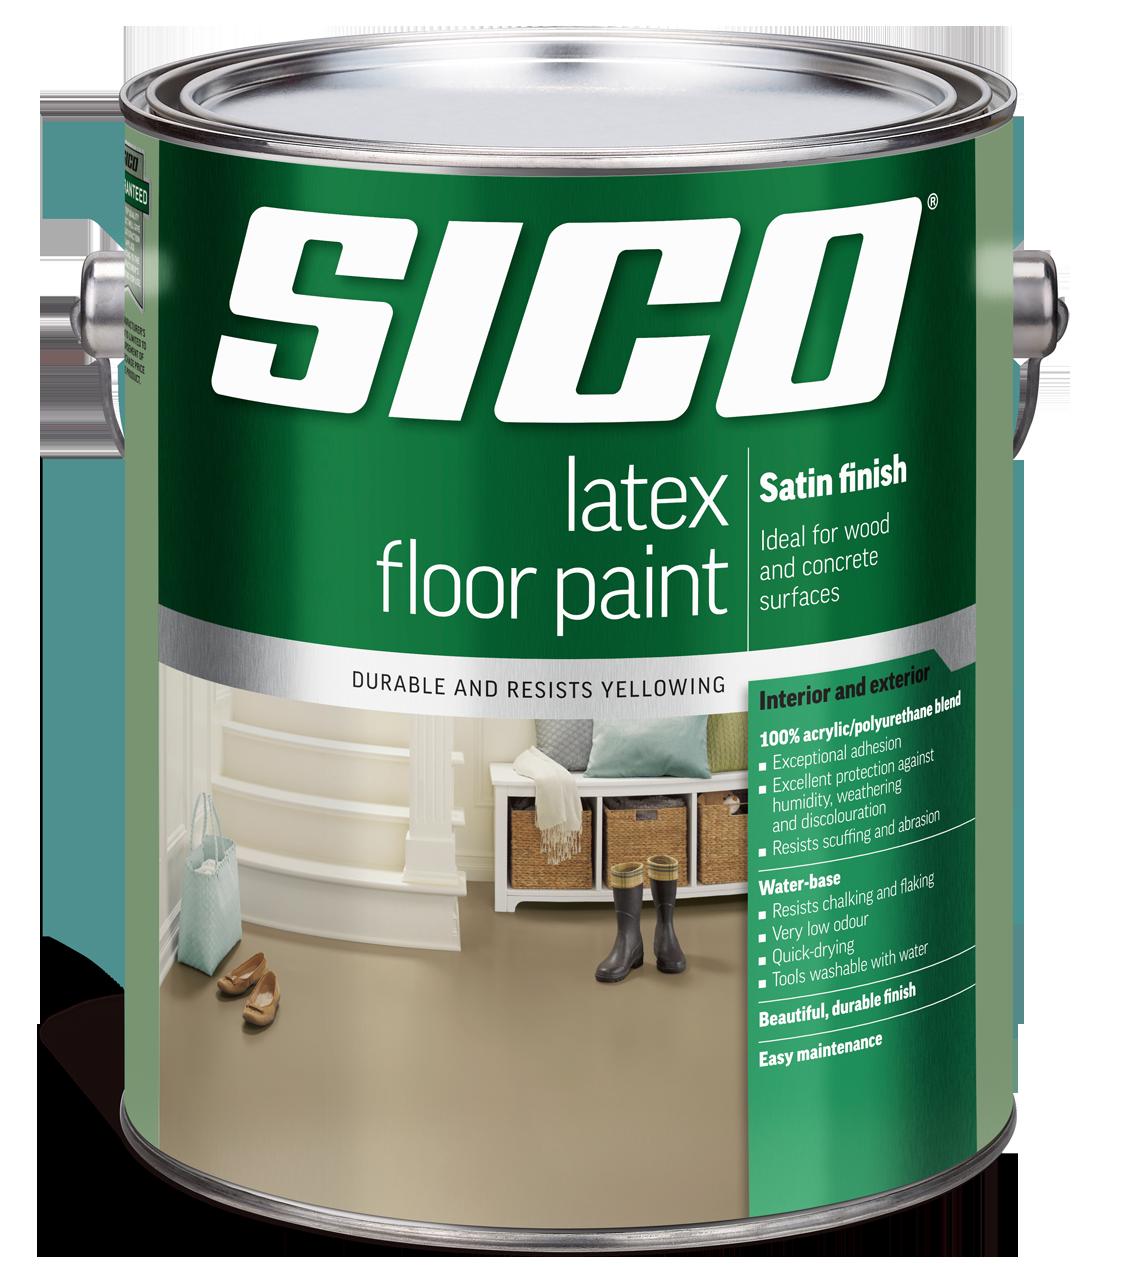 Sico Paint Wm Dyck Sons